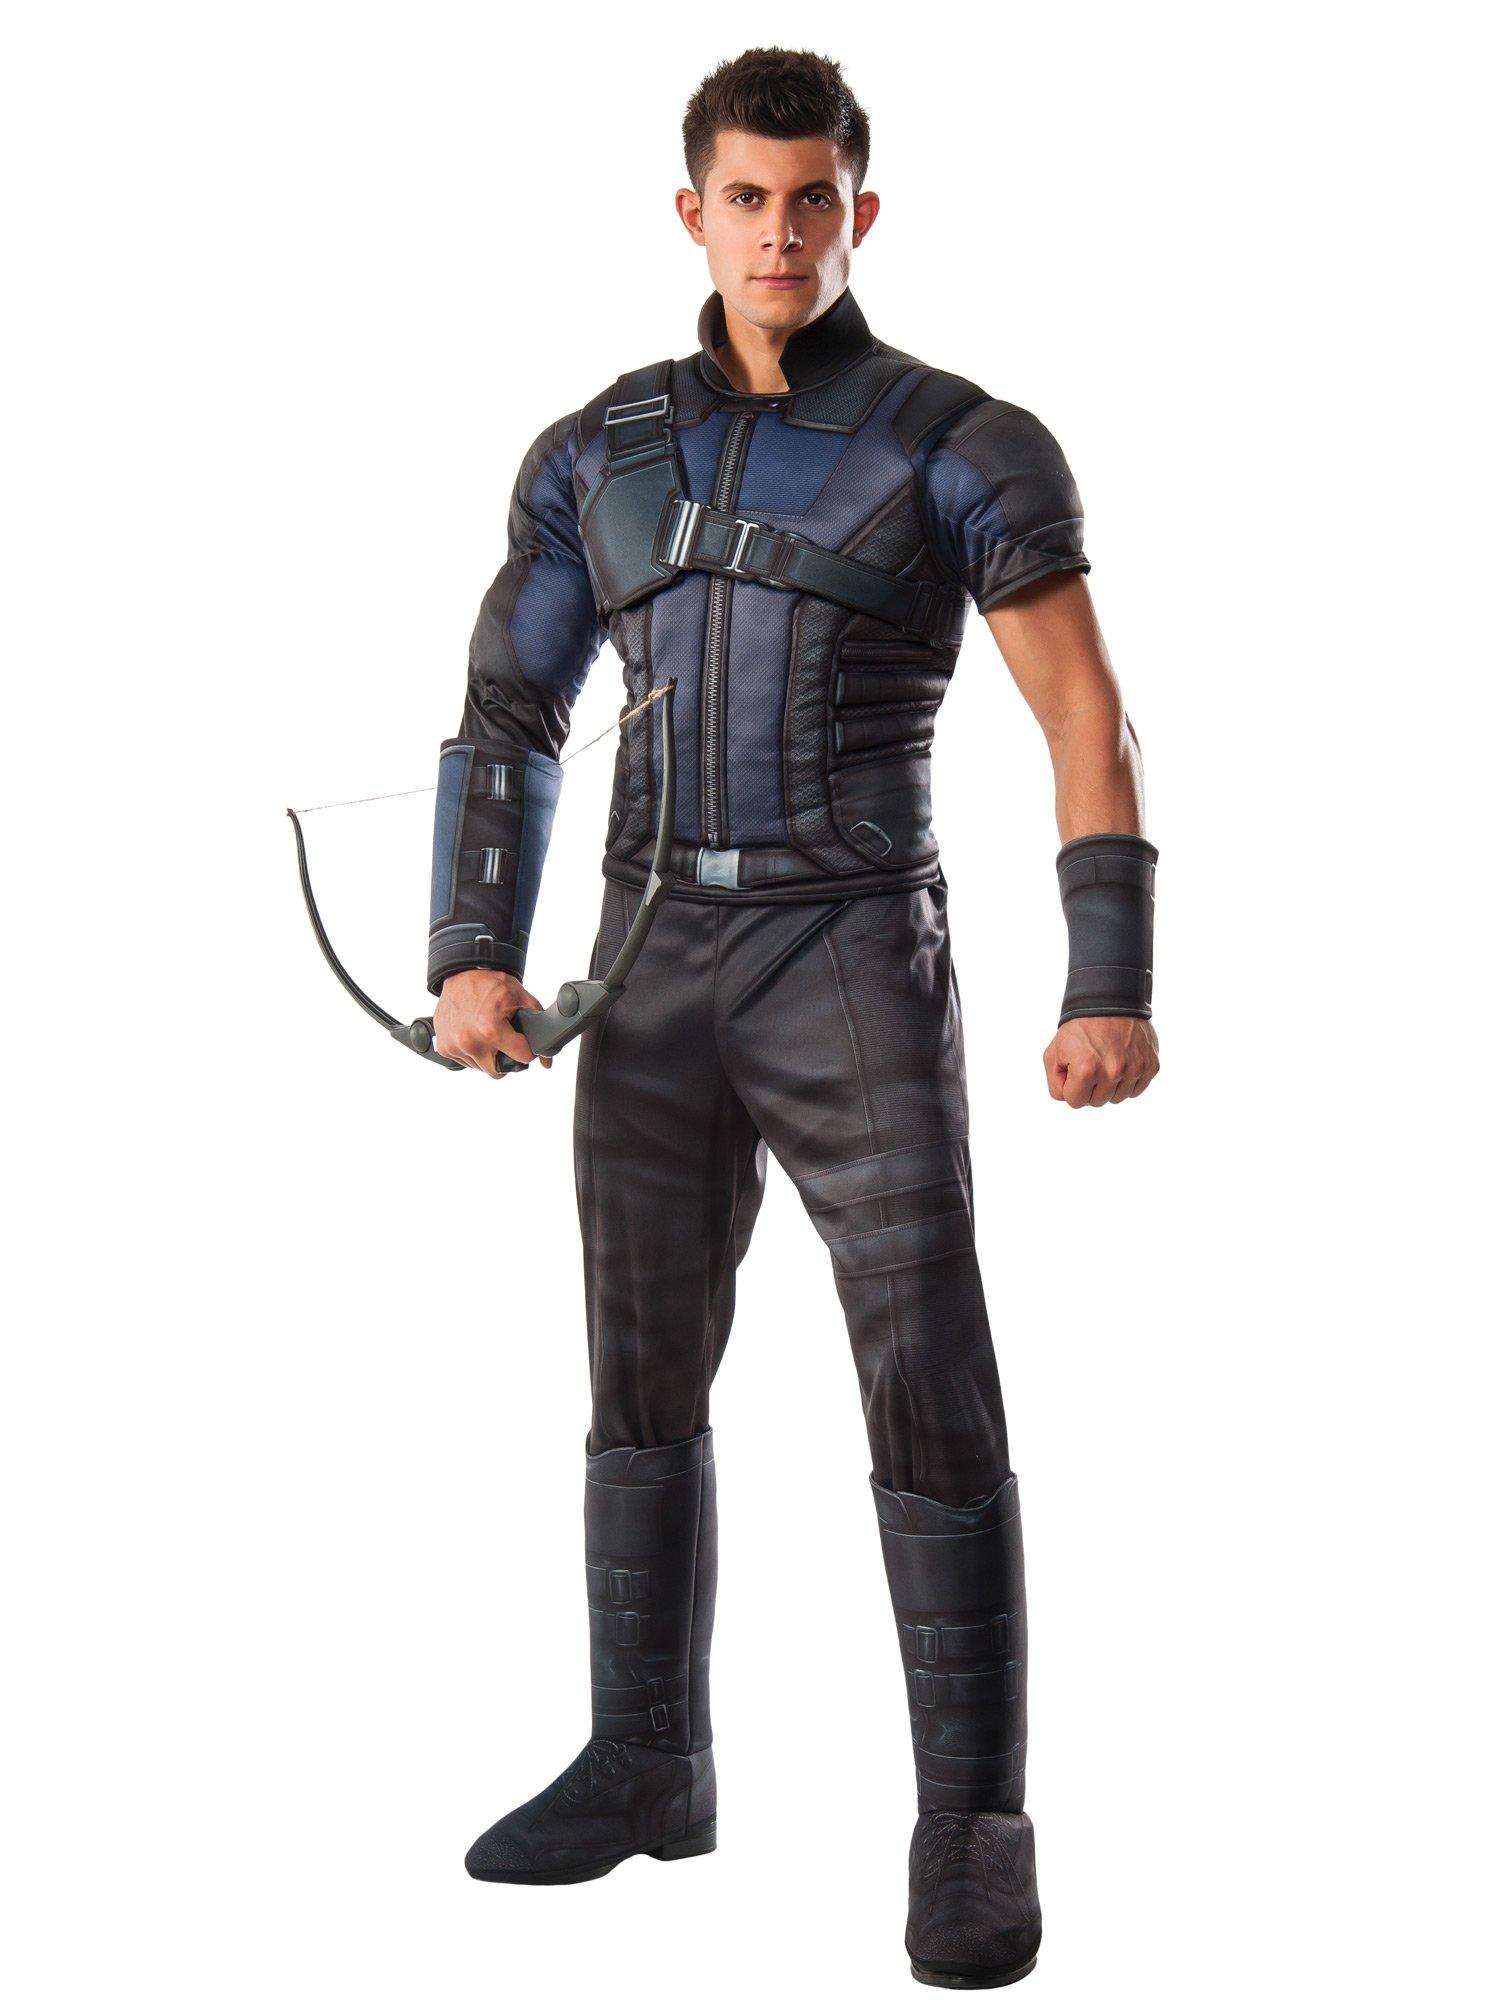 Rubie's Costume Co Marvel Men's Captain America: Civil War Deluxe Muscle Chest Hawkeye Costume